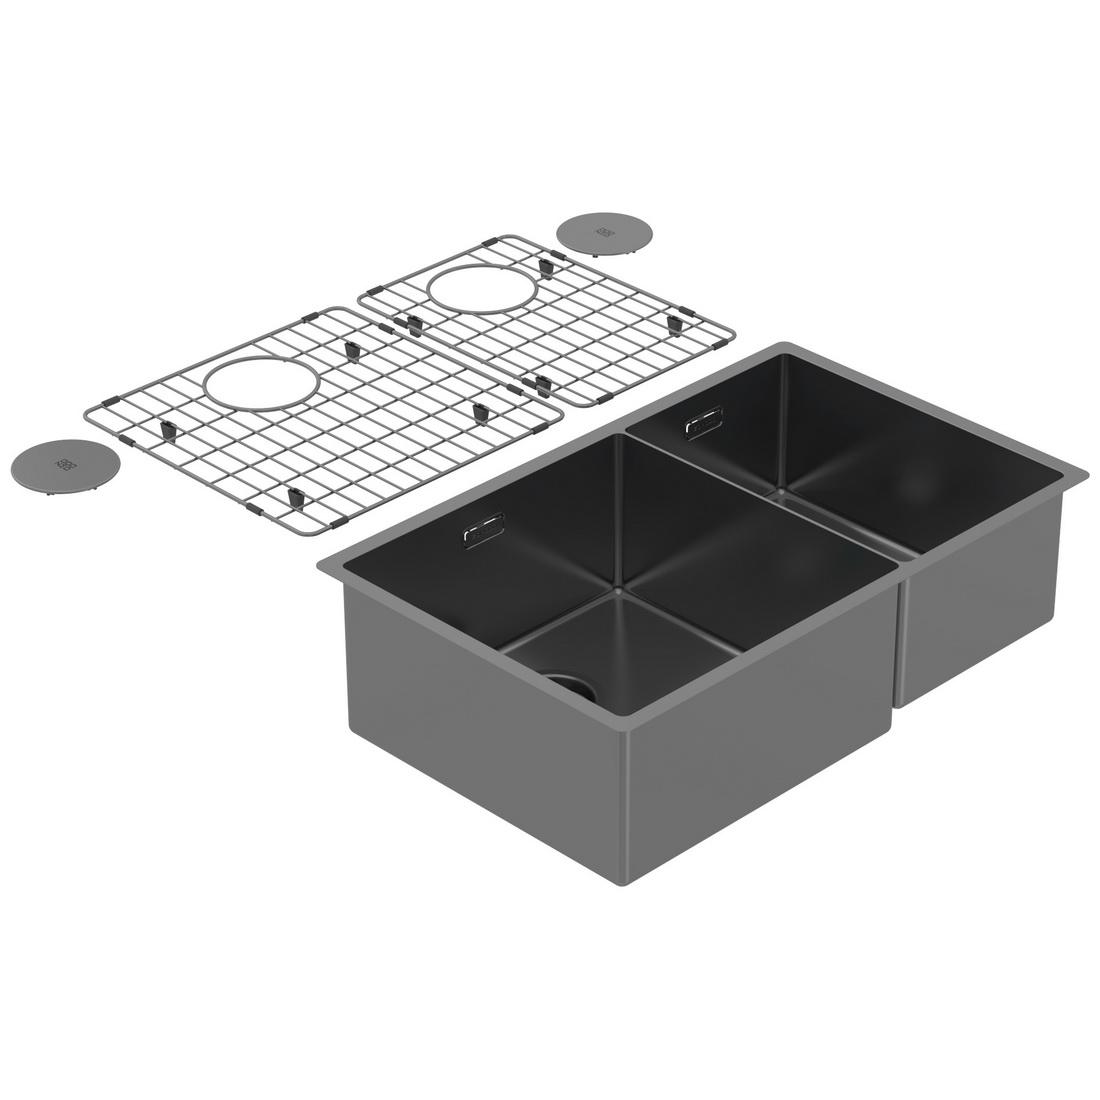 704x440x200mm Double Bowl Undermount Kitchen Sink Cayman Black PearlArc Finish